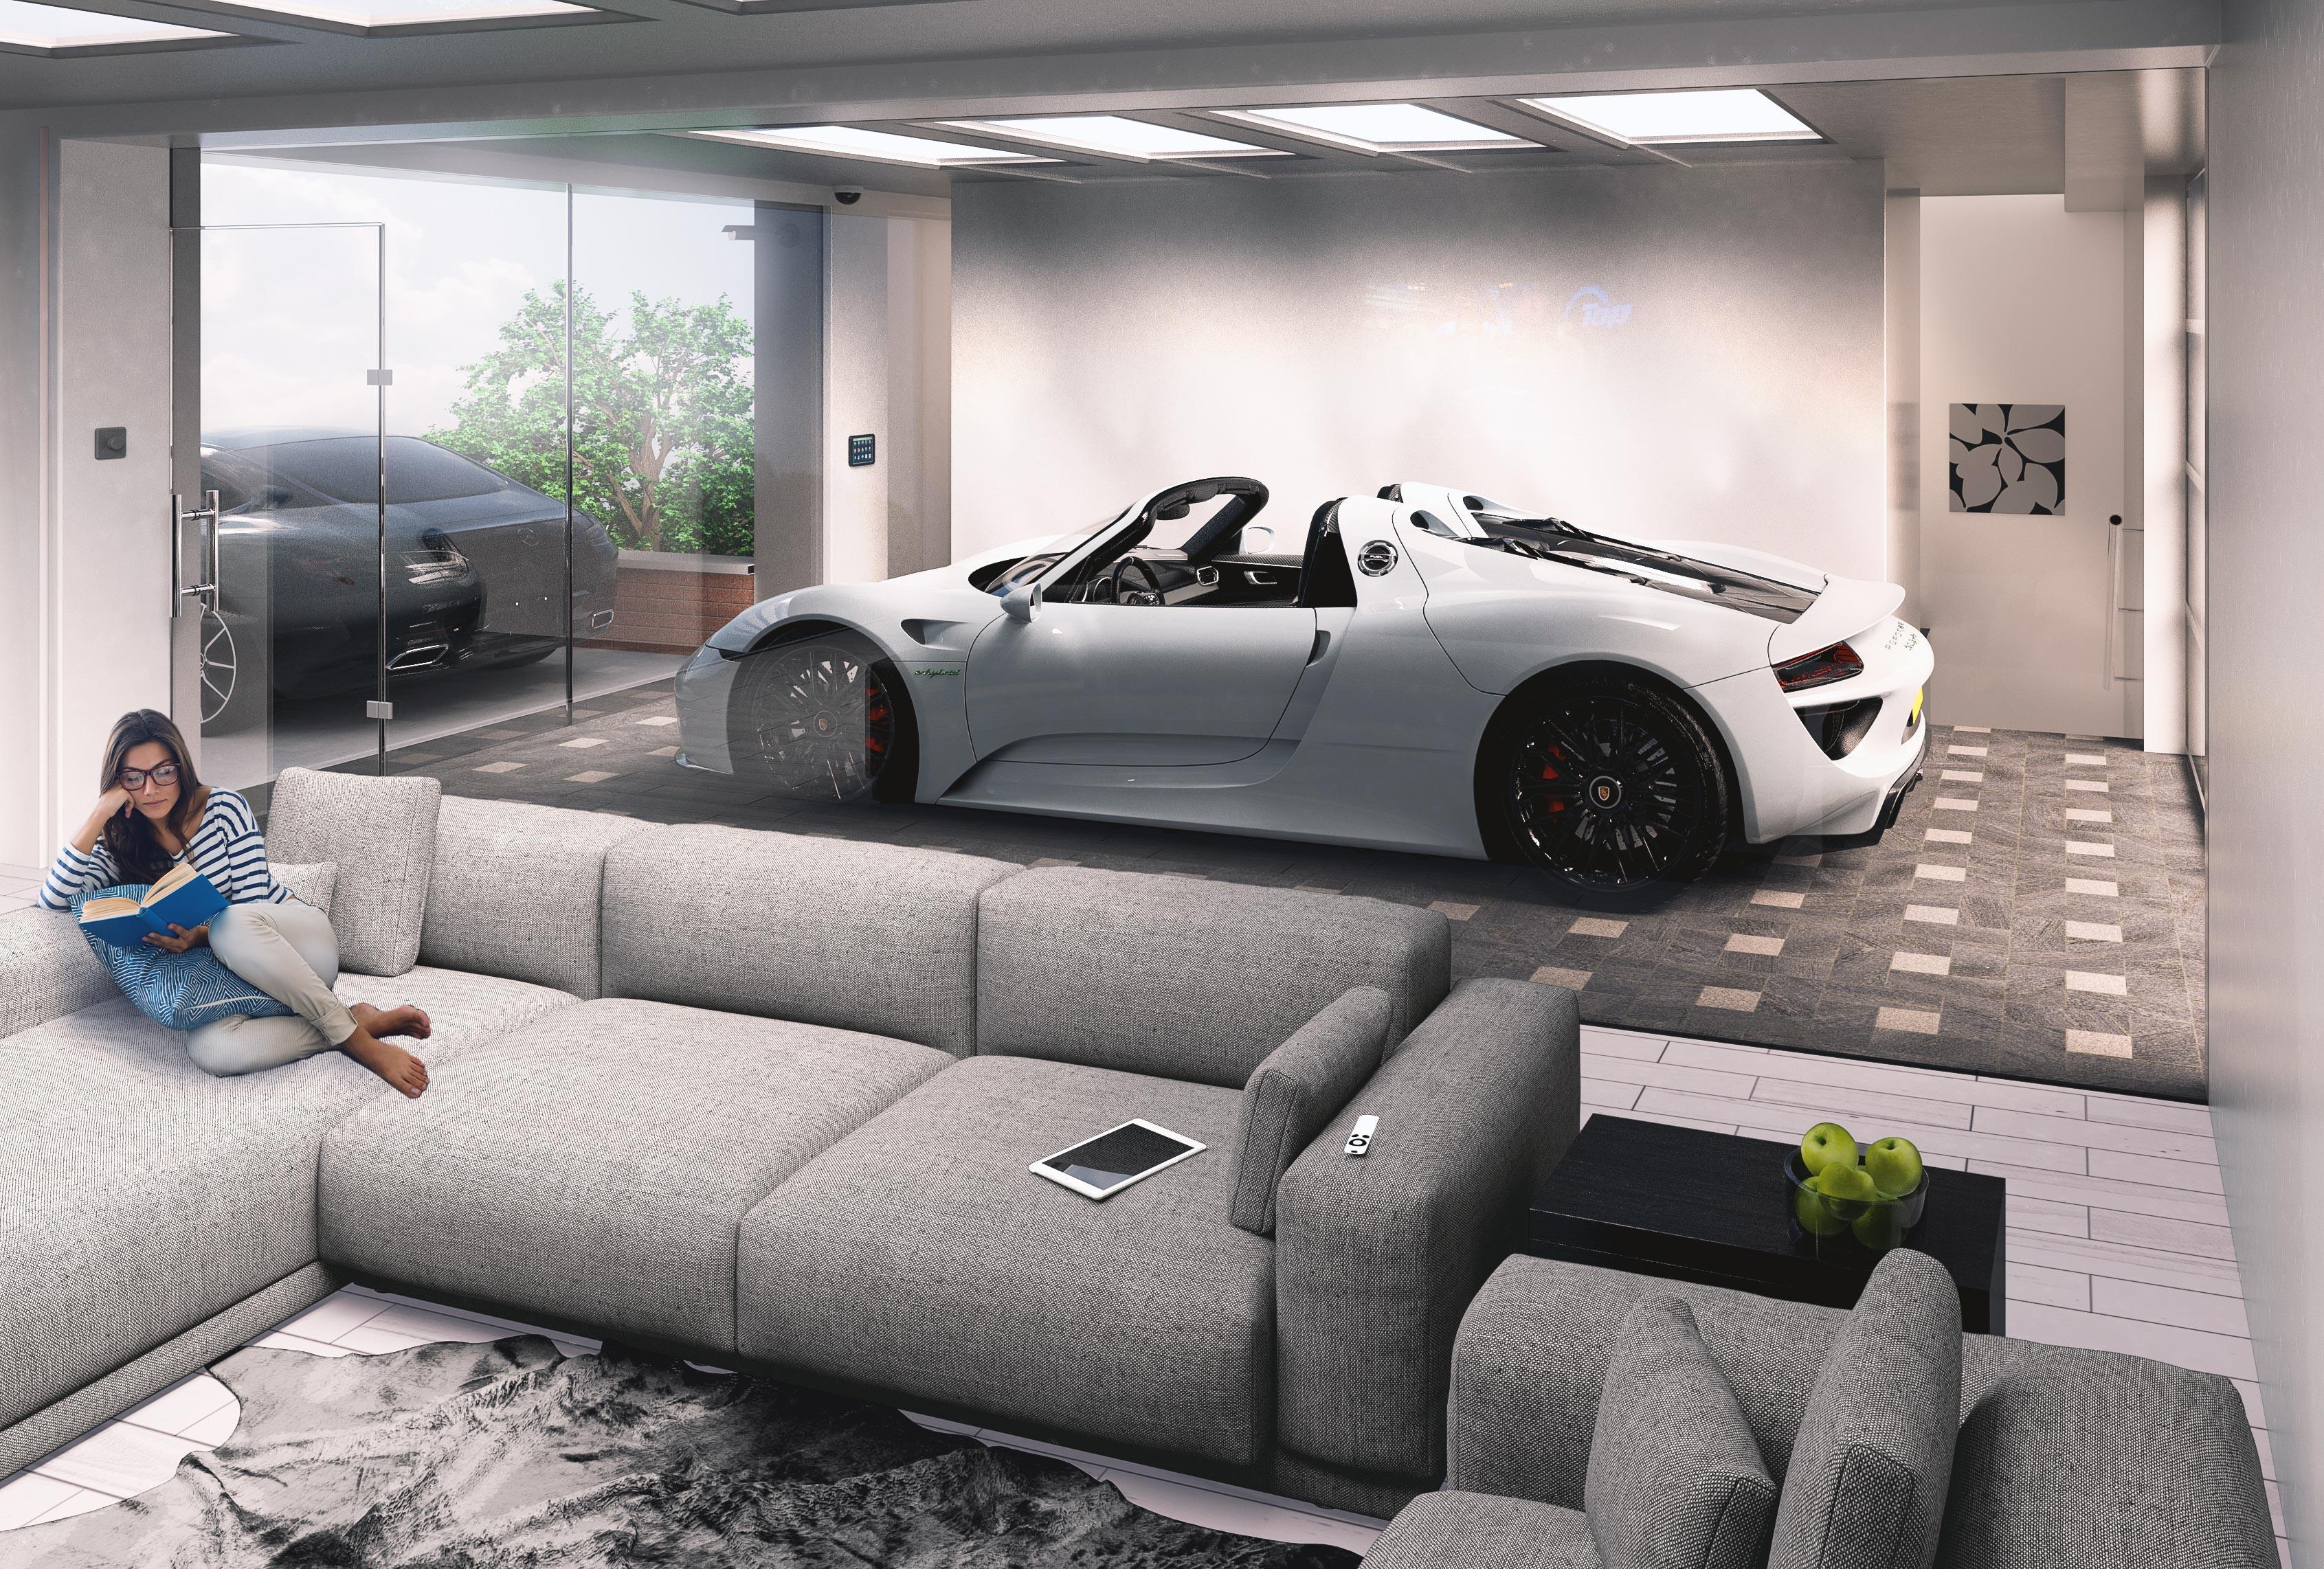 3d Rendering of a Flat Garage